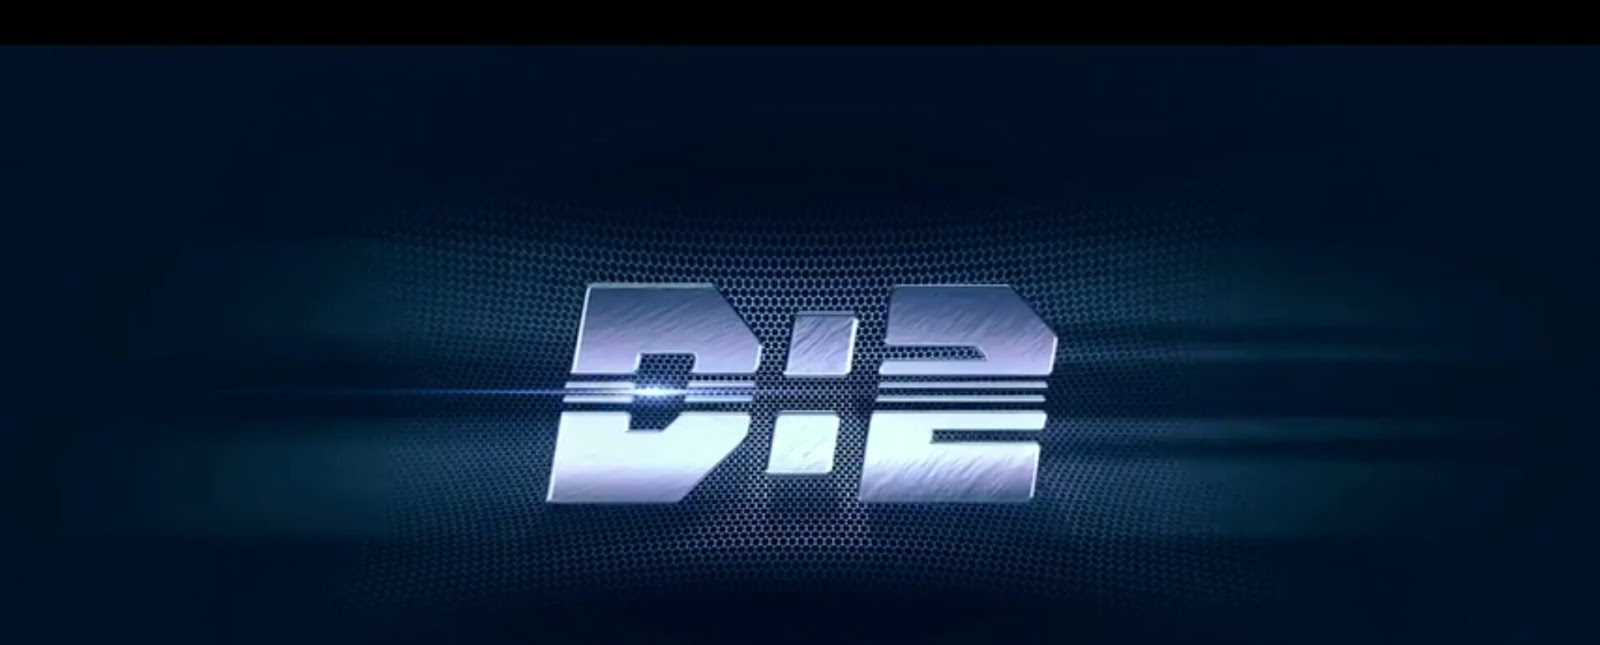 download dhoom 2 full movie in hd omoviedownloads